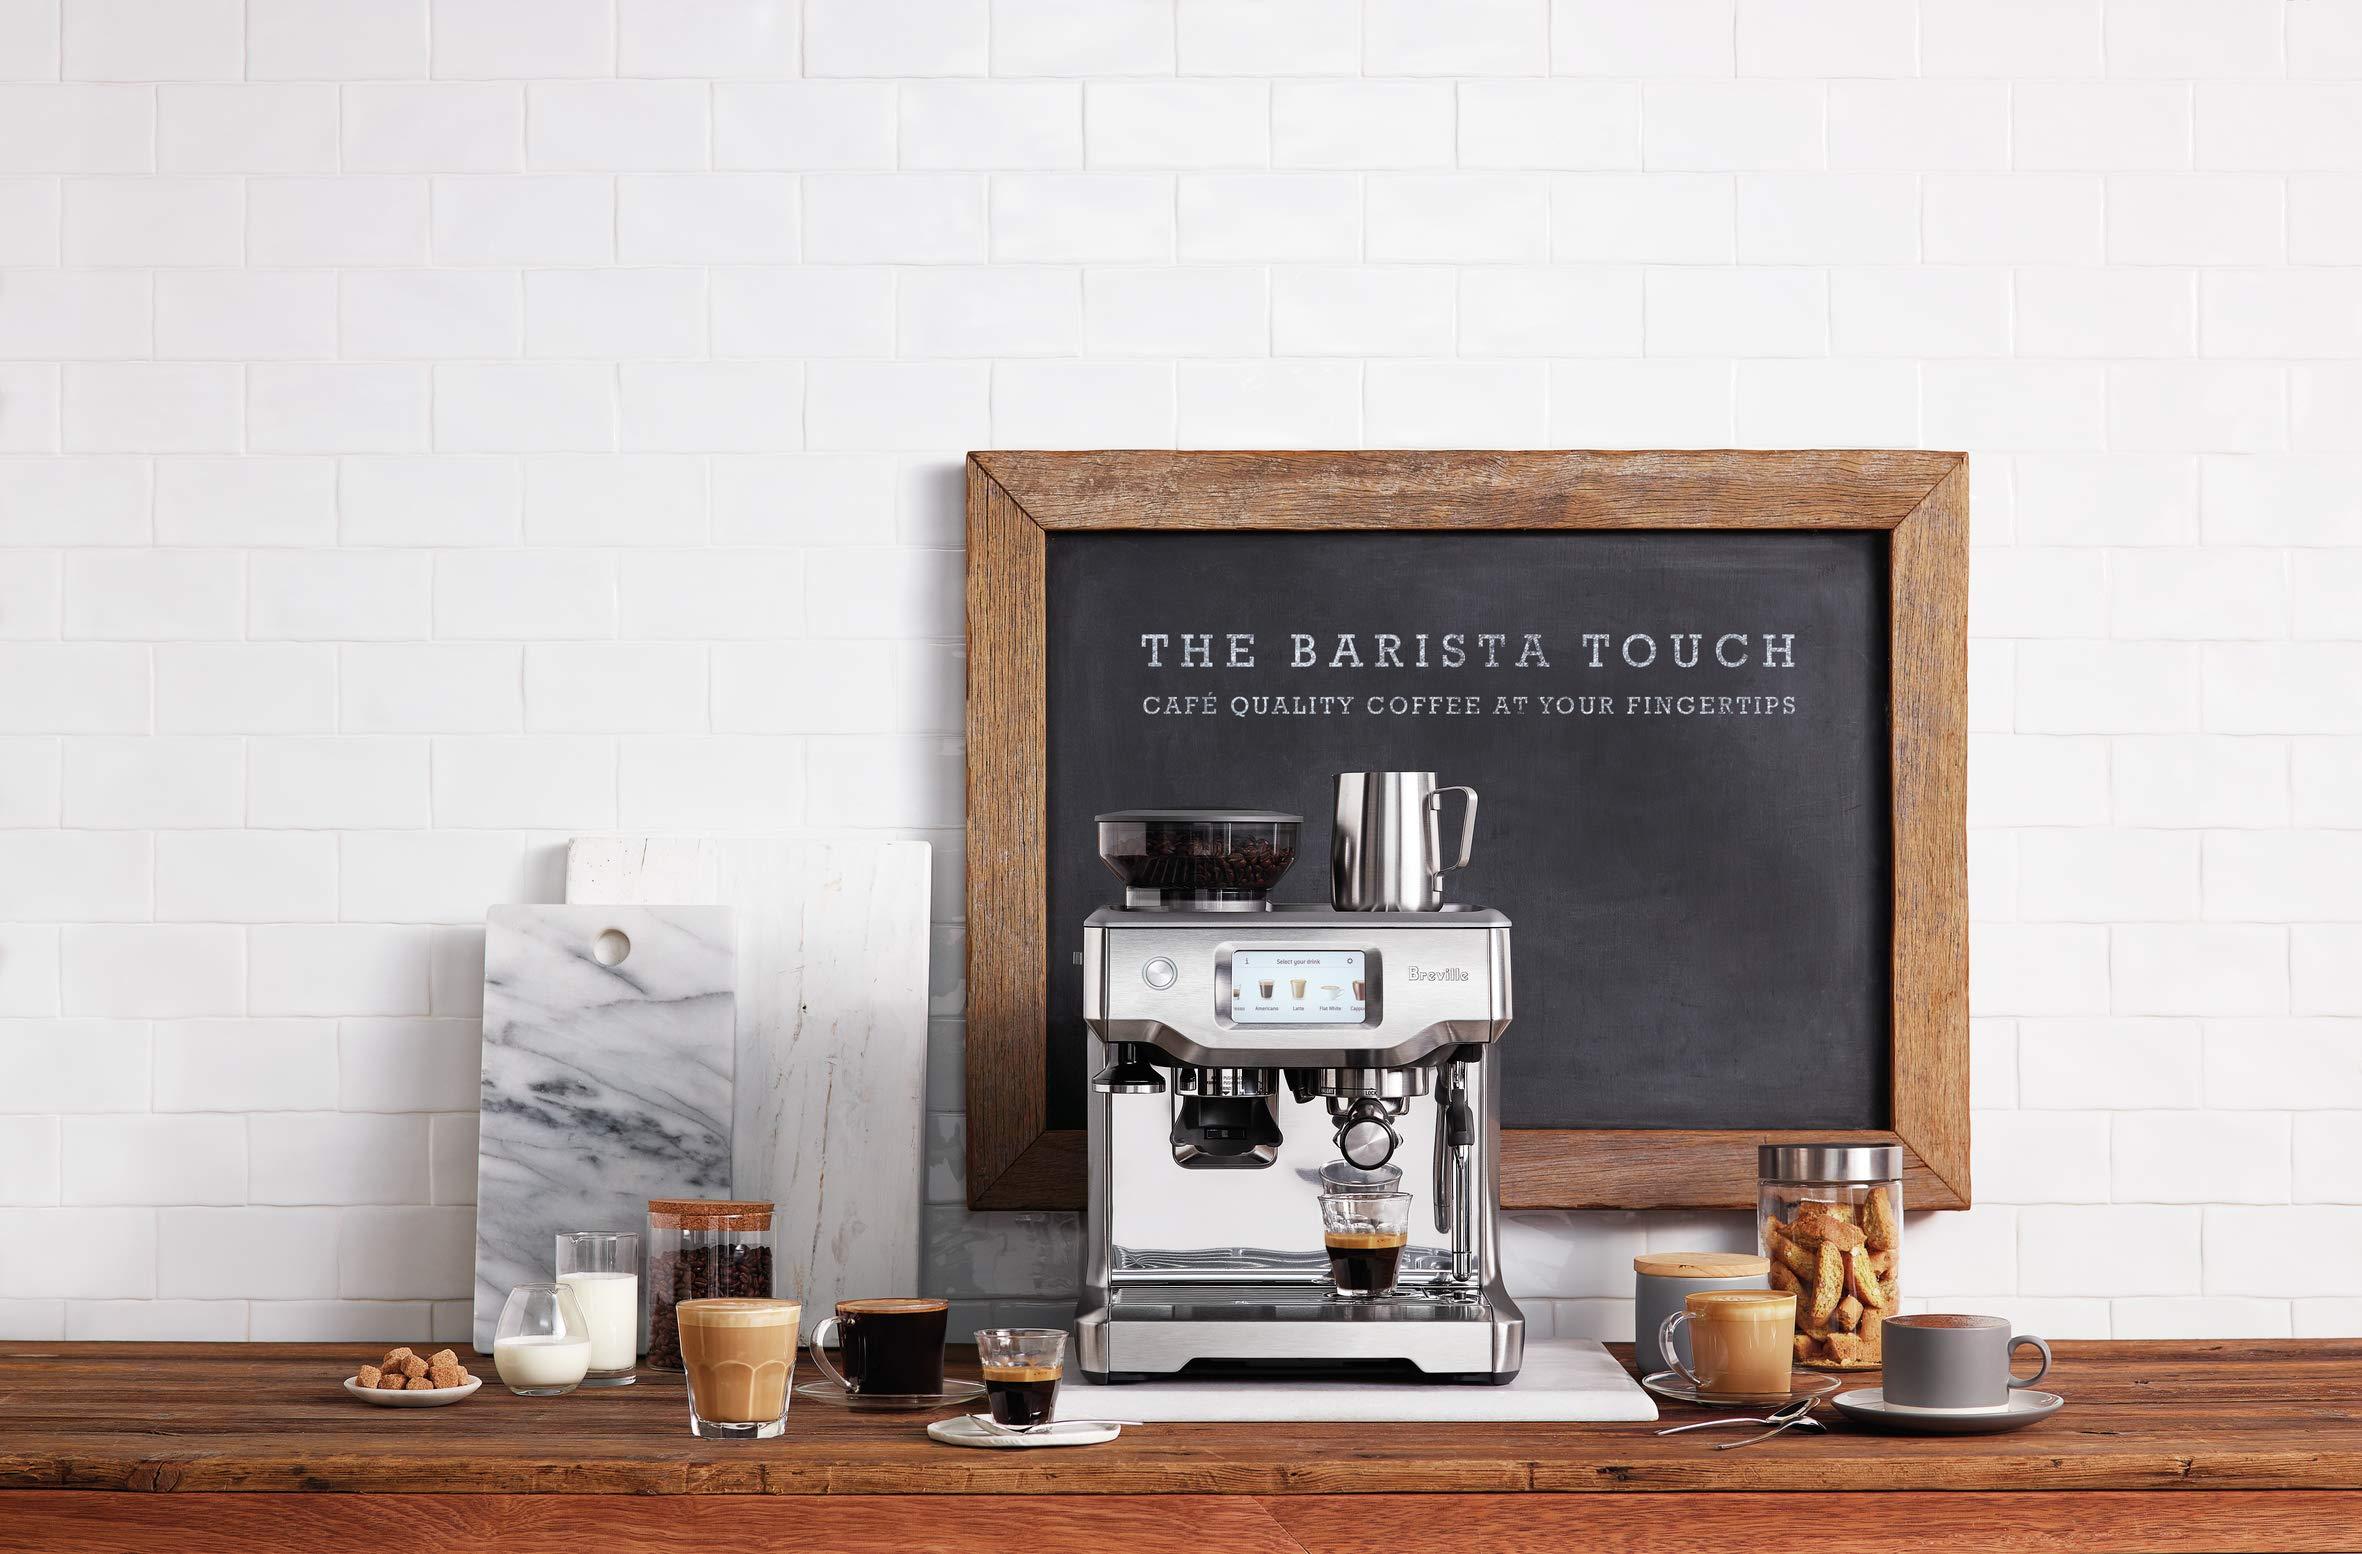 Breville Bes880bss Barista Touch Espresso Maker Stainless